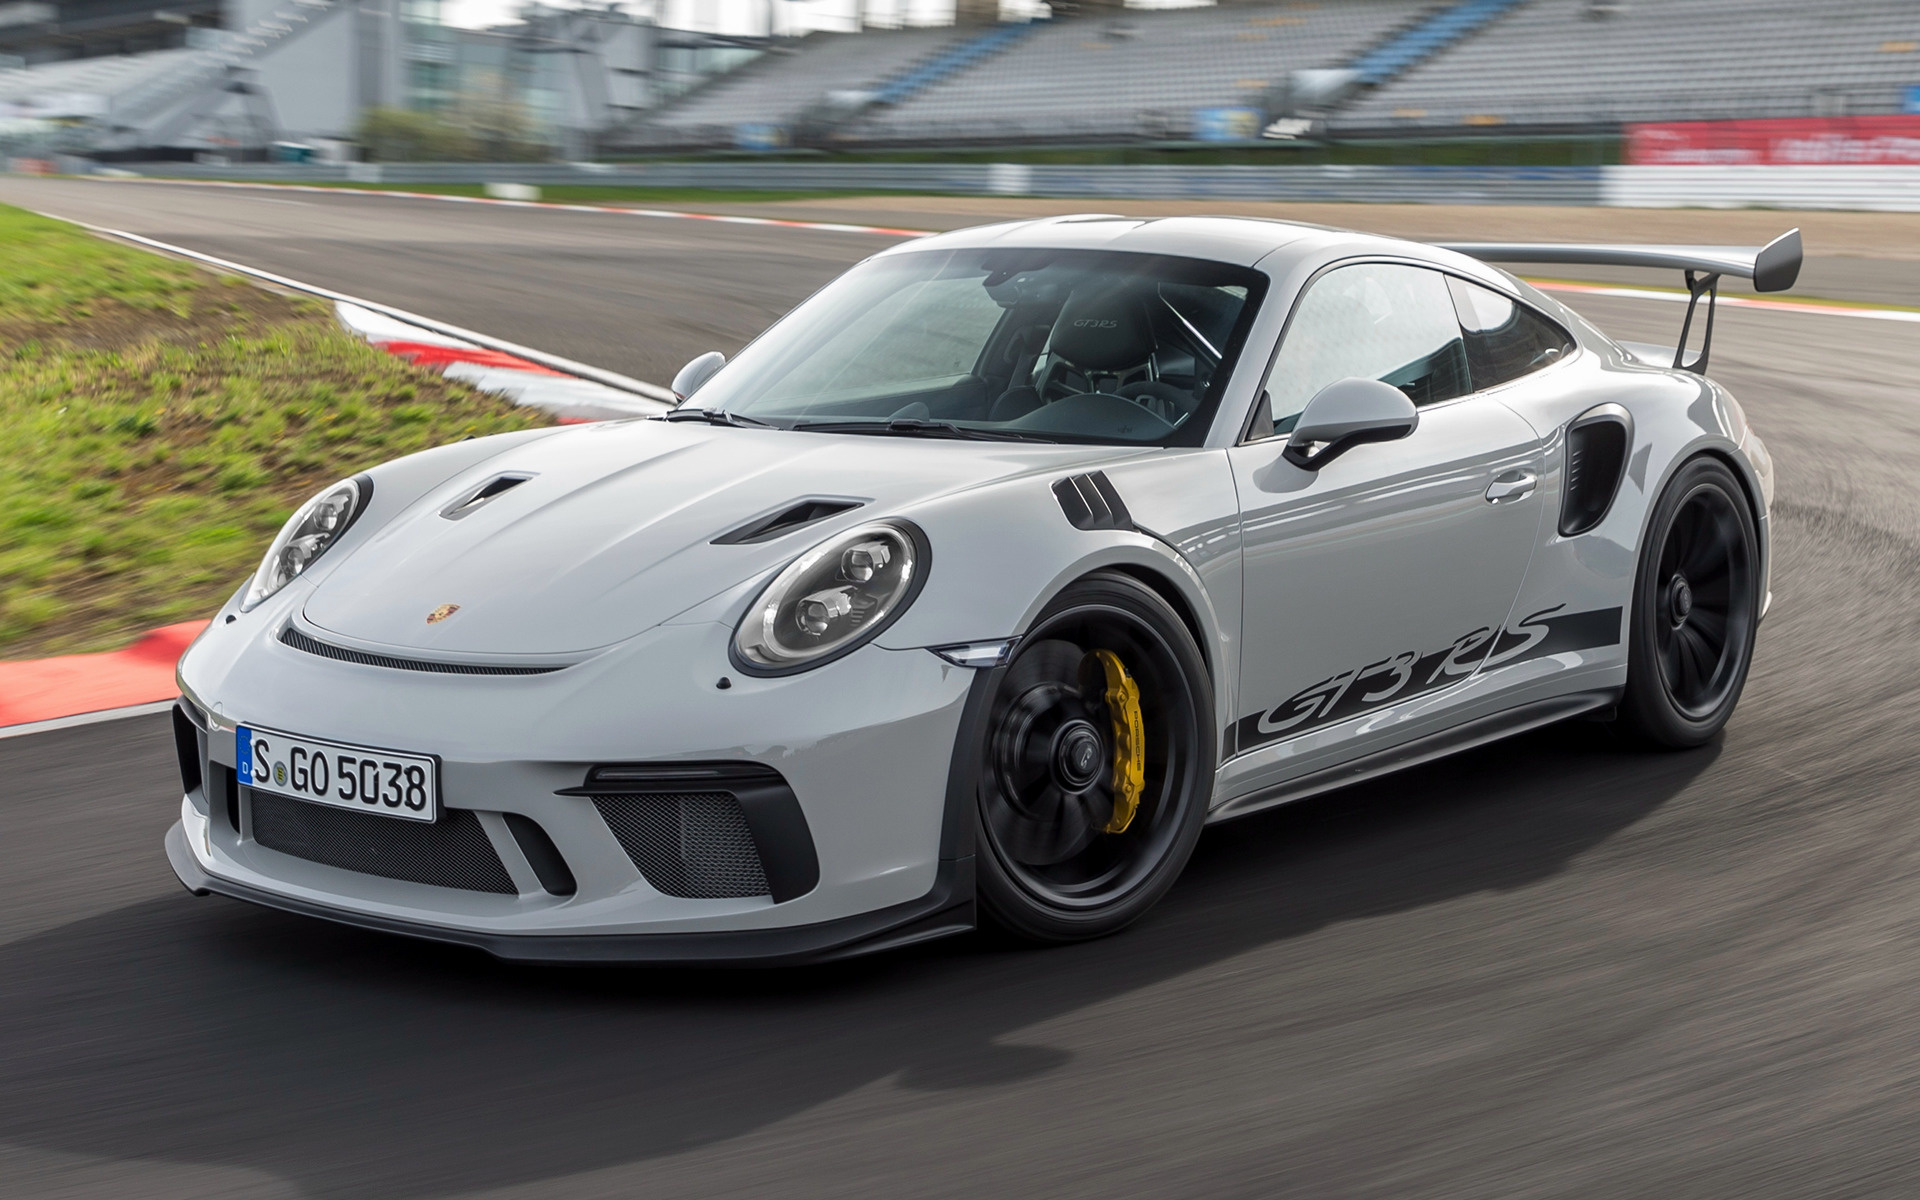 Porsche 911 Turbo S >> 2018 Porsche 911 GT3 RS - Wallpapers and HD Images | Car Pixel